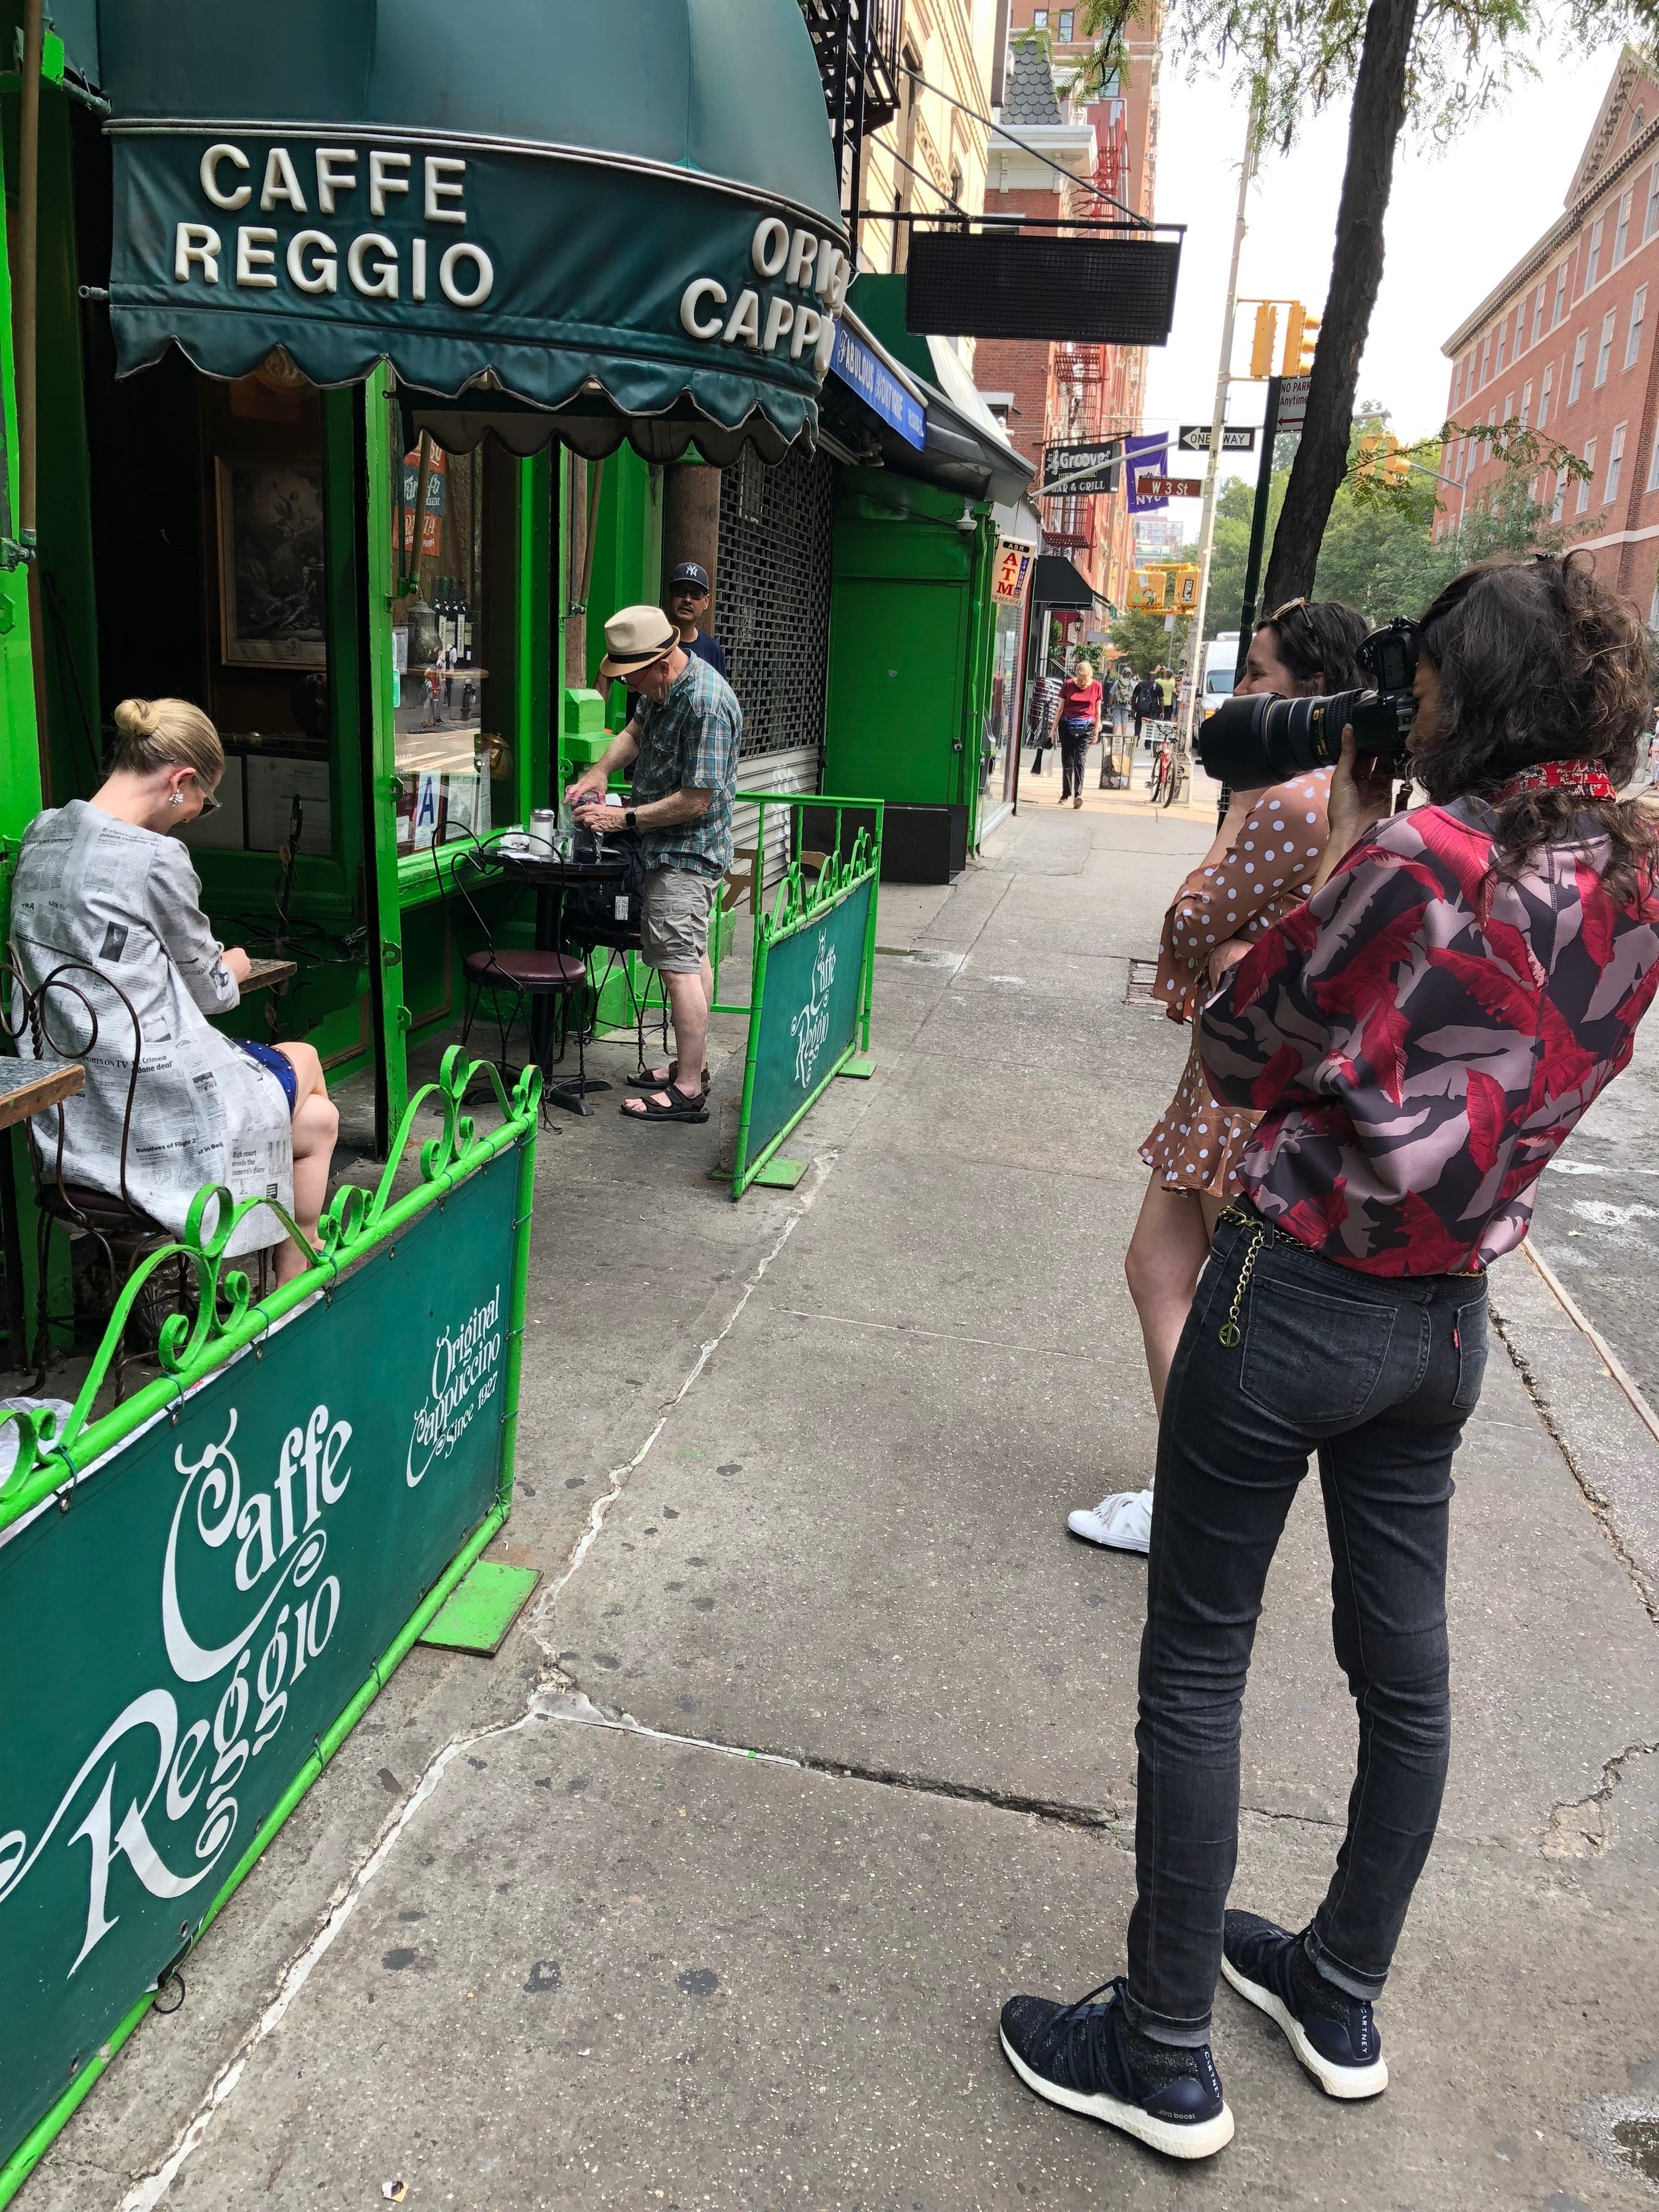 Shooting outside legendary Caffe Reggio